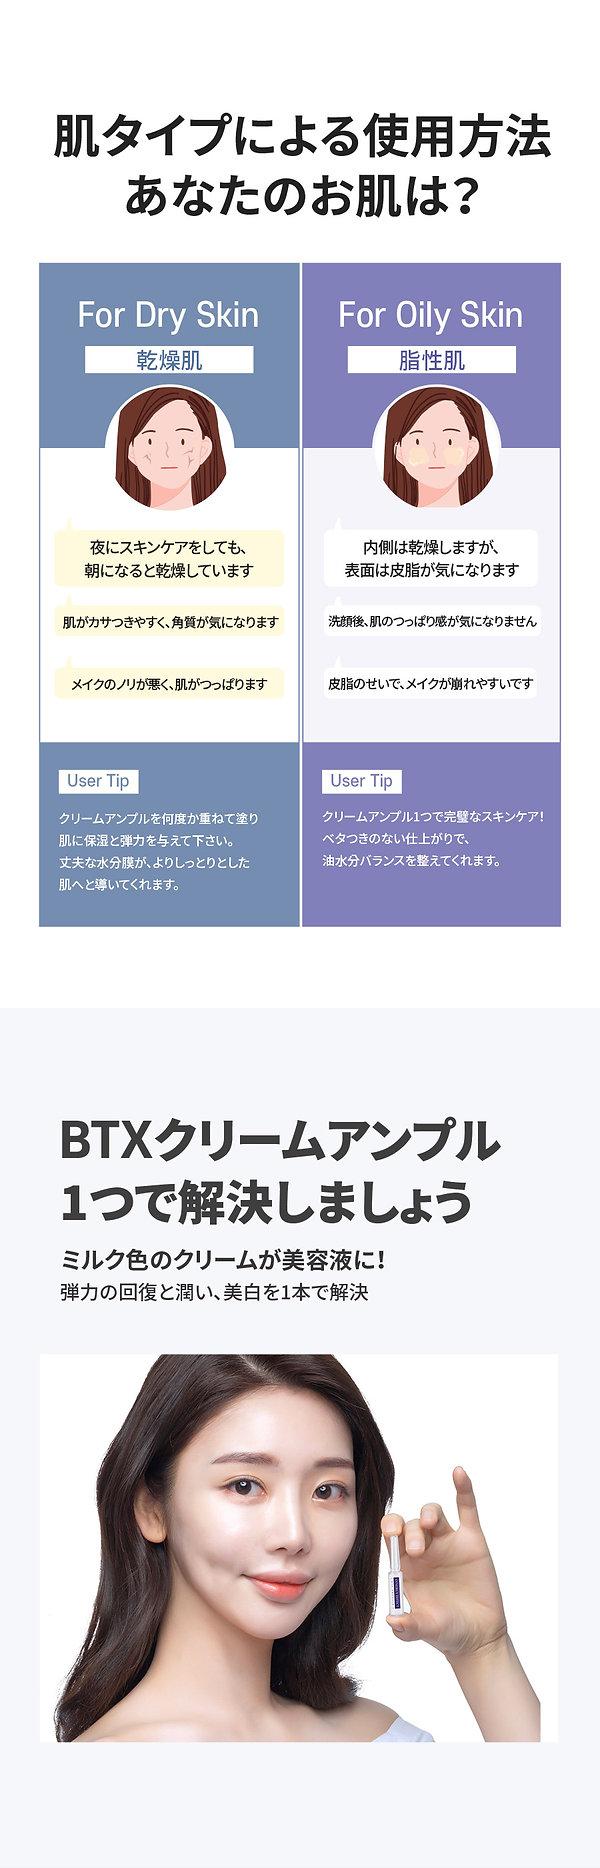 btx2021_creamample-(일어-용량-작)_02.jpg